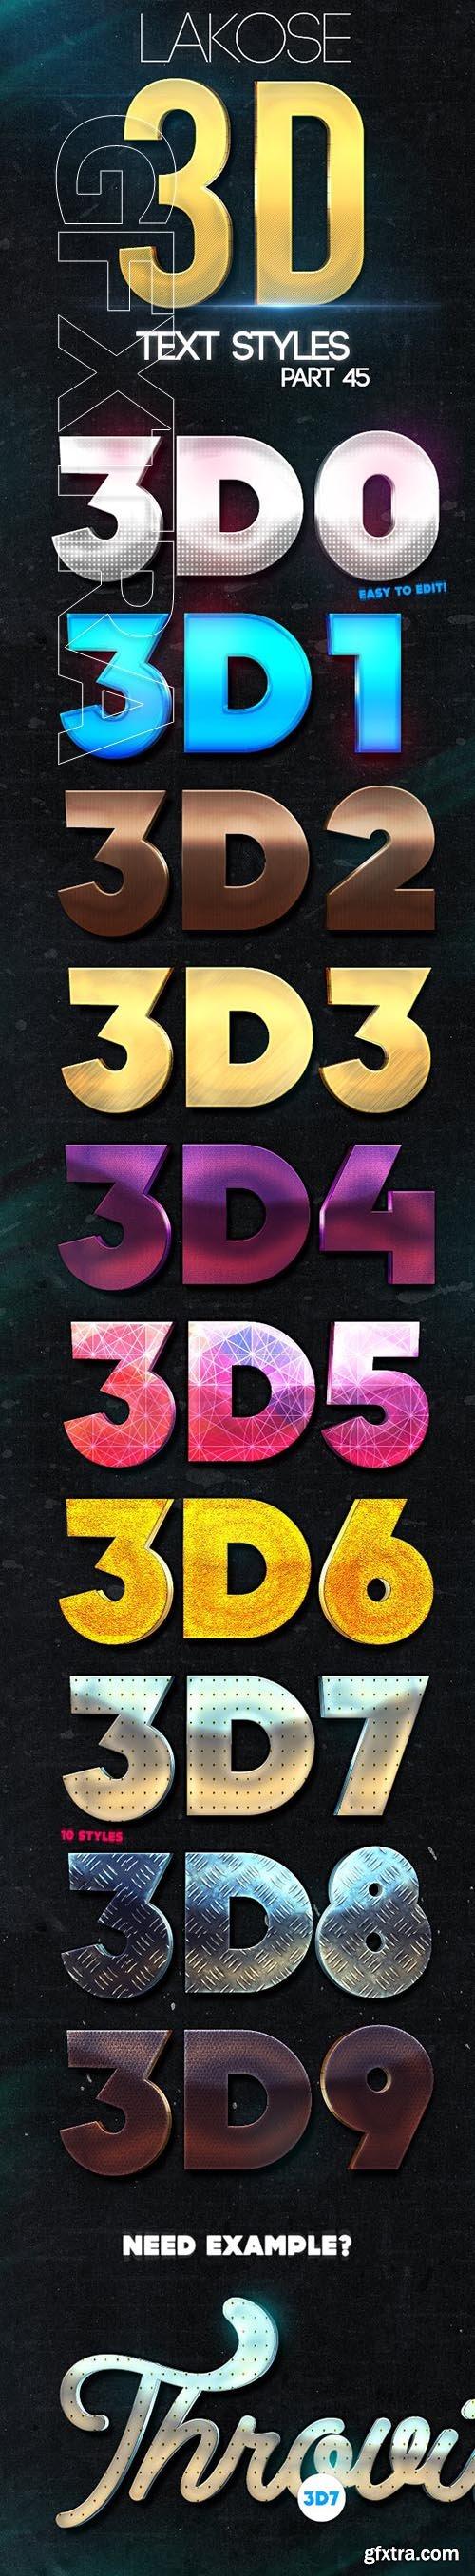 GraphicRiver - Lakose 3D Text Styles Part 45 23661732